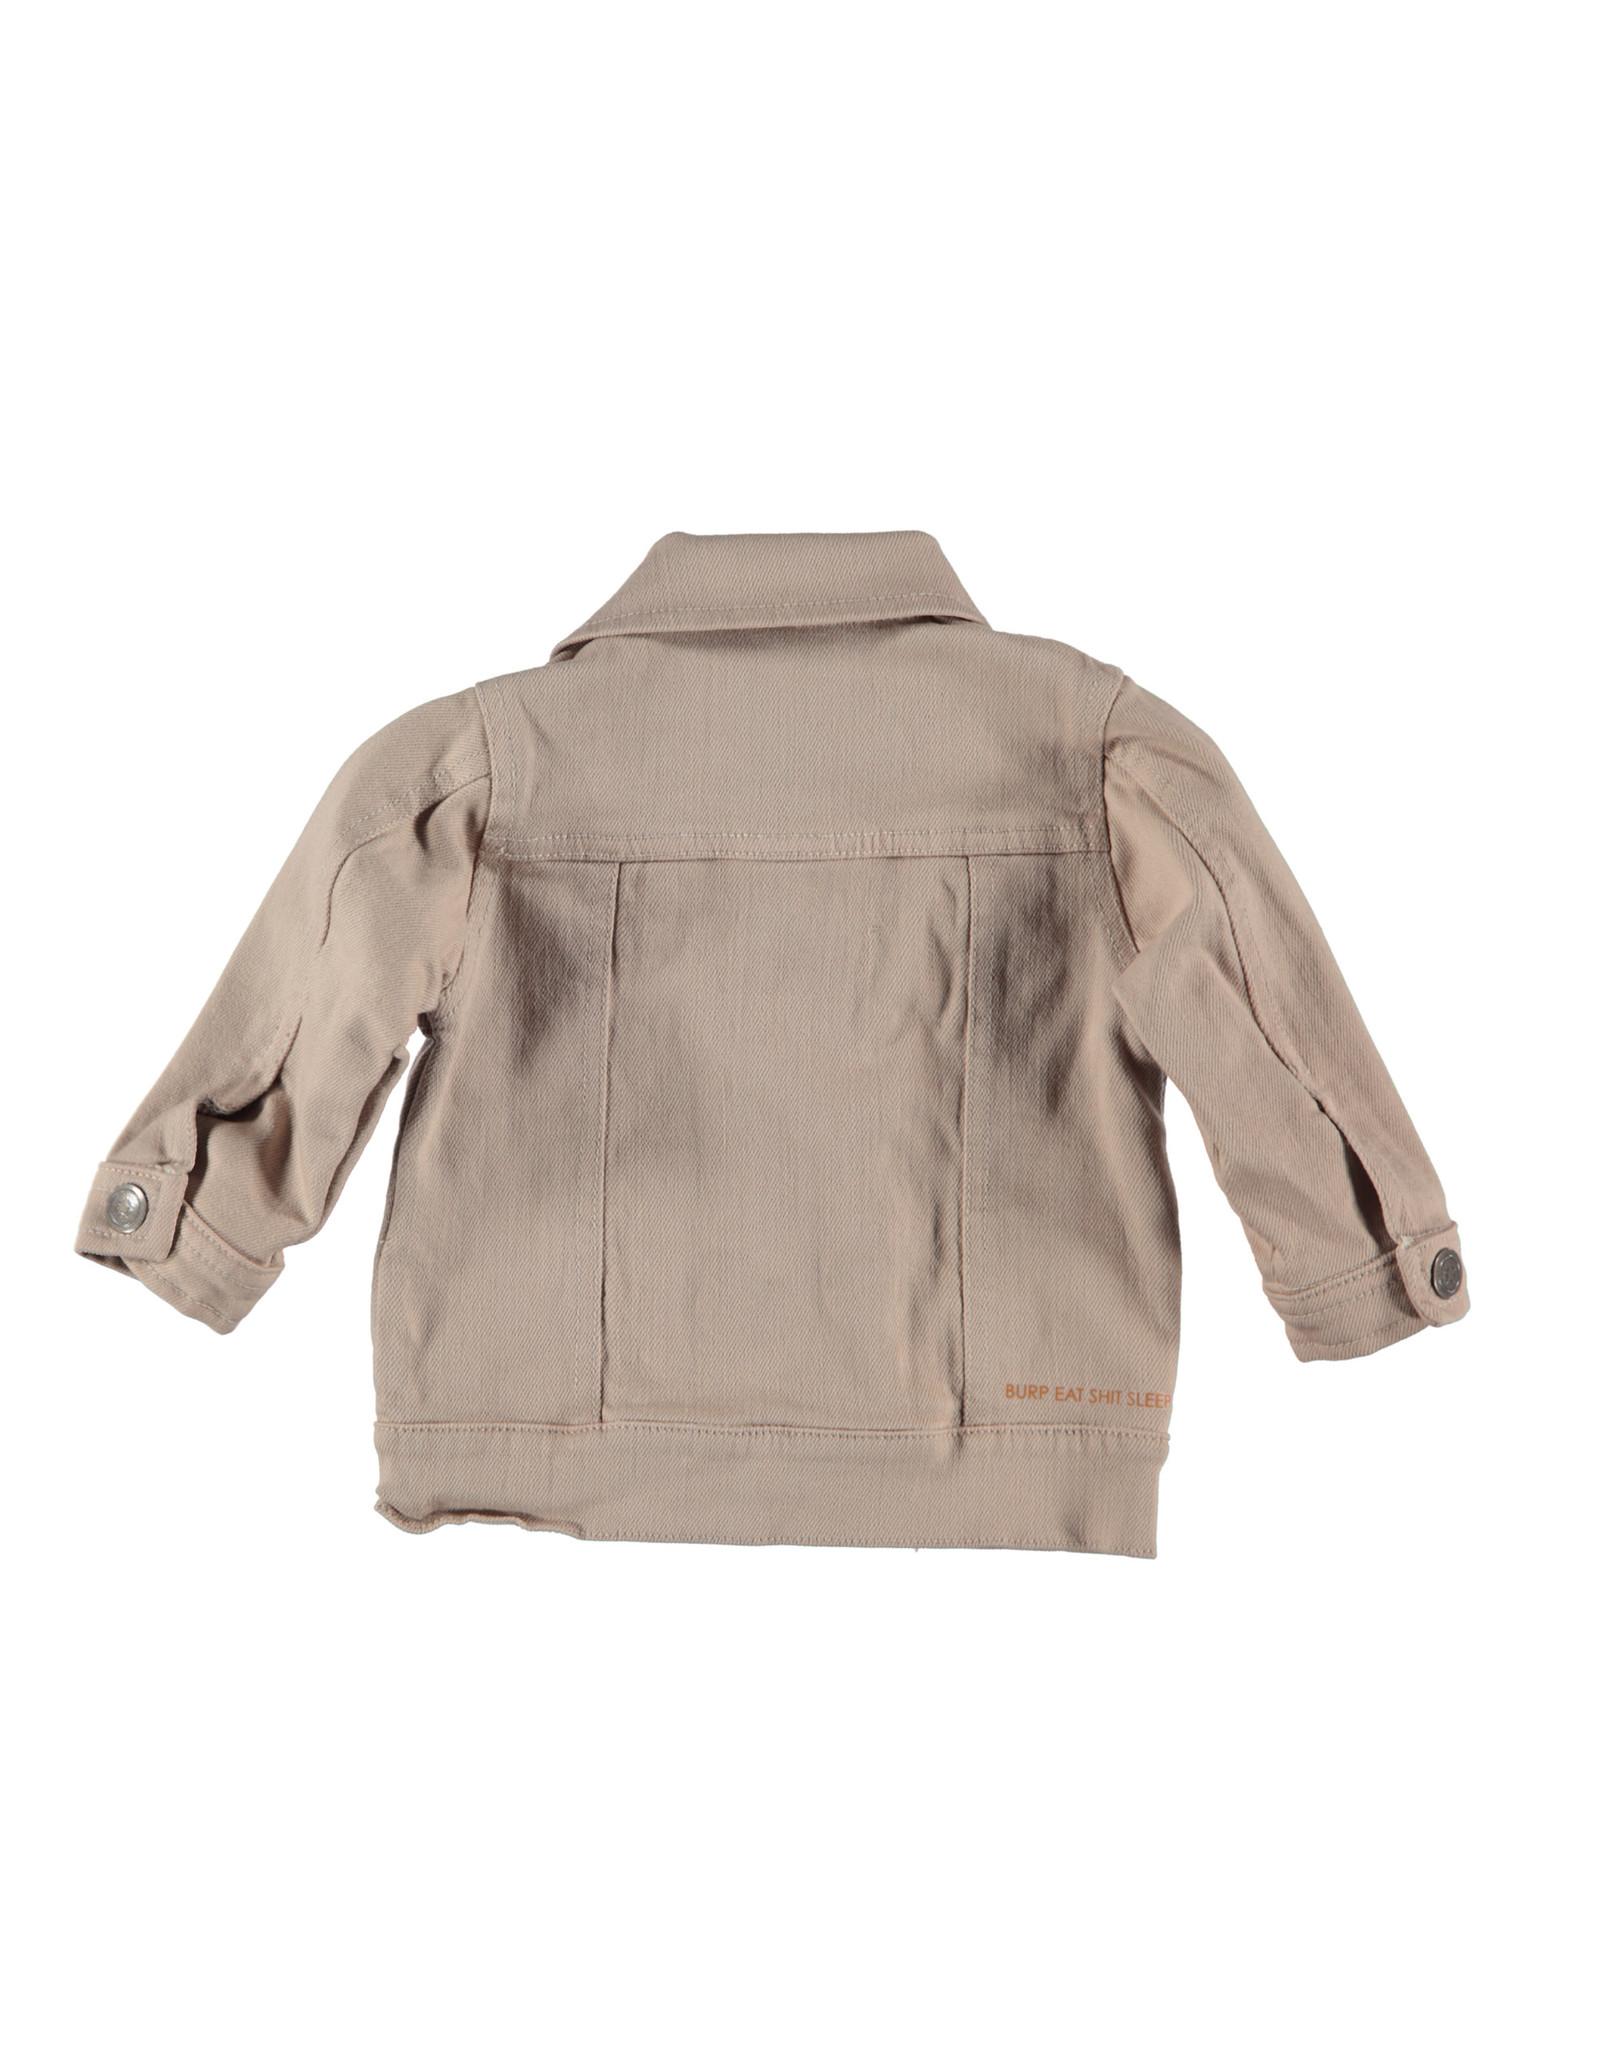 BESS Jacket Sand